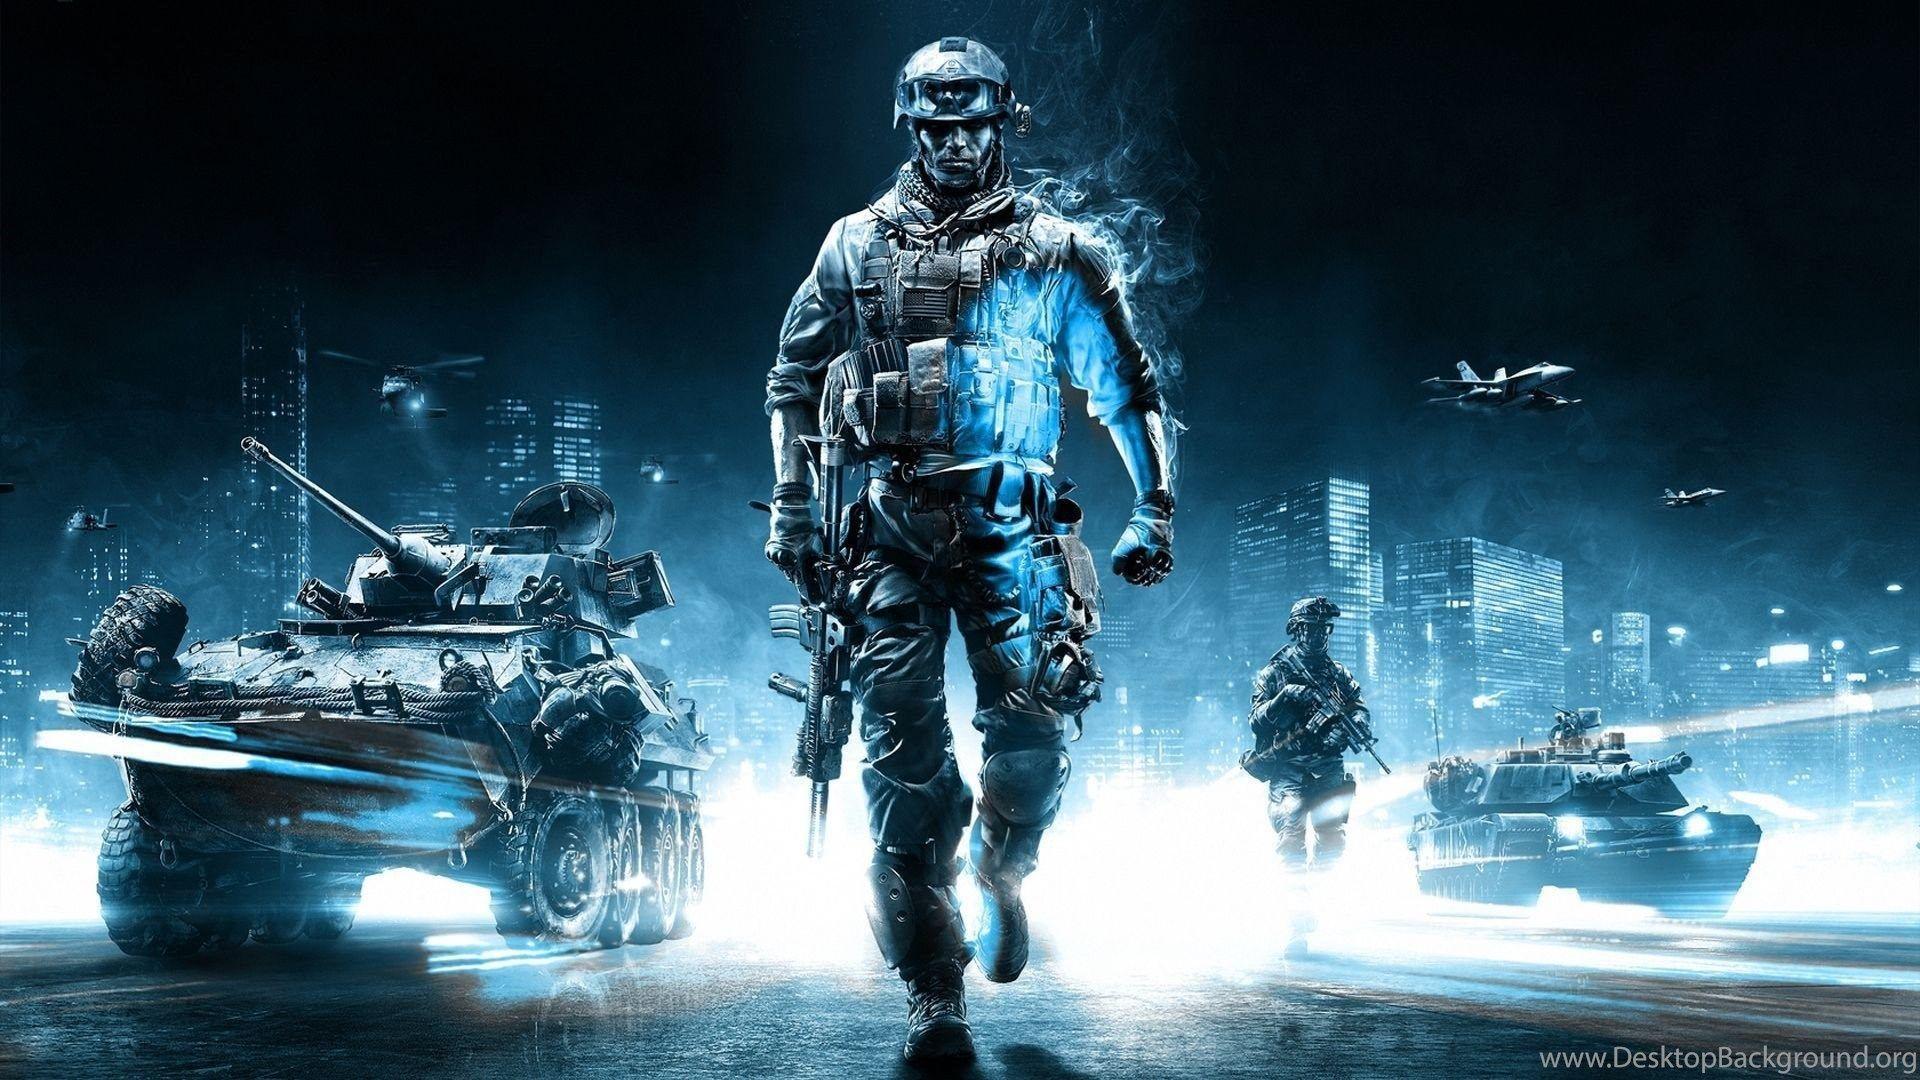 "1920x1080 Blue Gaming Wallpapers ImgMob Desktop Background""> · Download · 1920x1080 Blue Gaming Wallpapers ..."